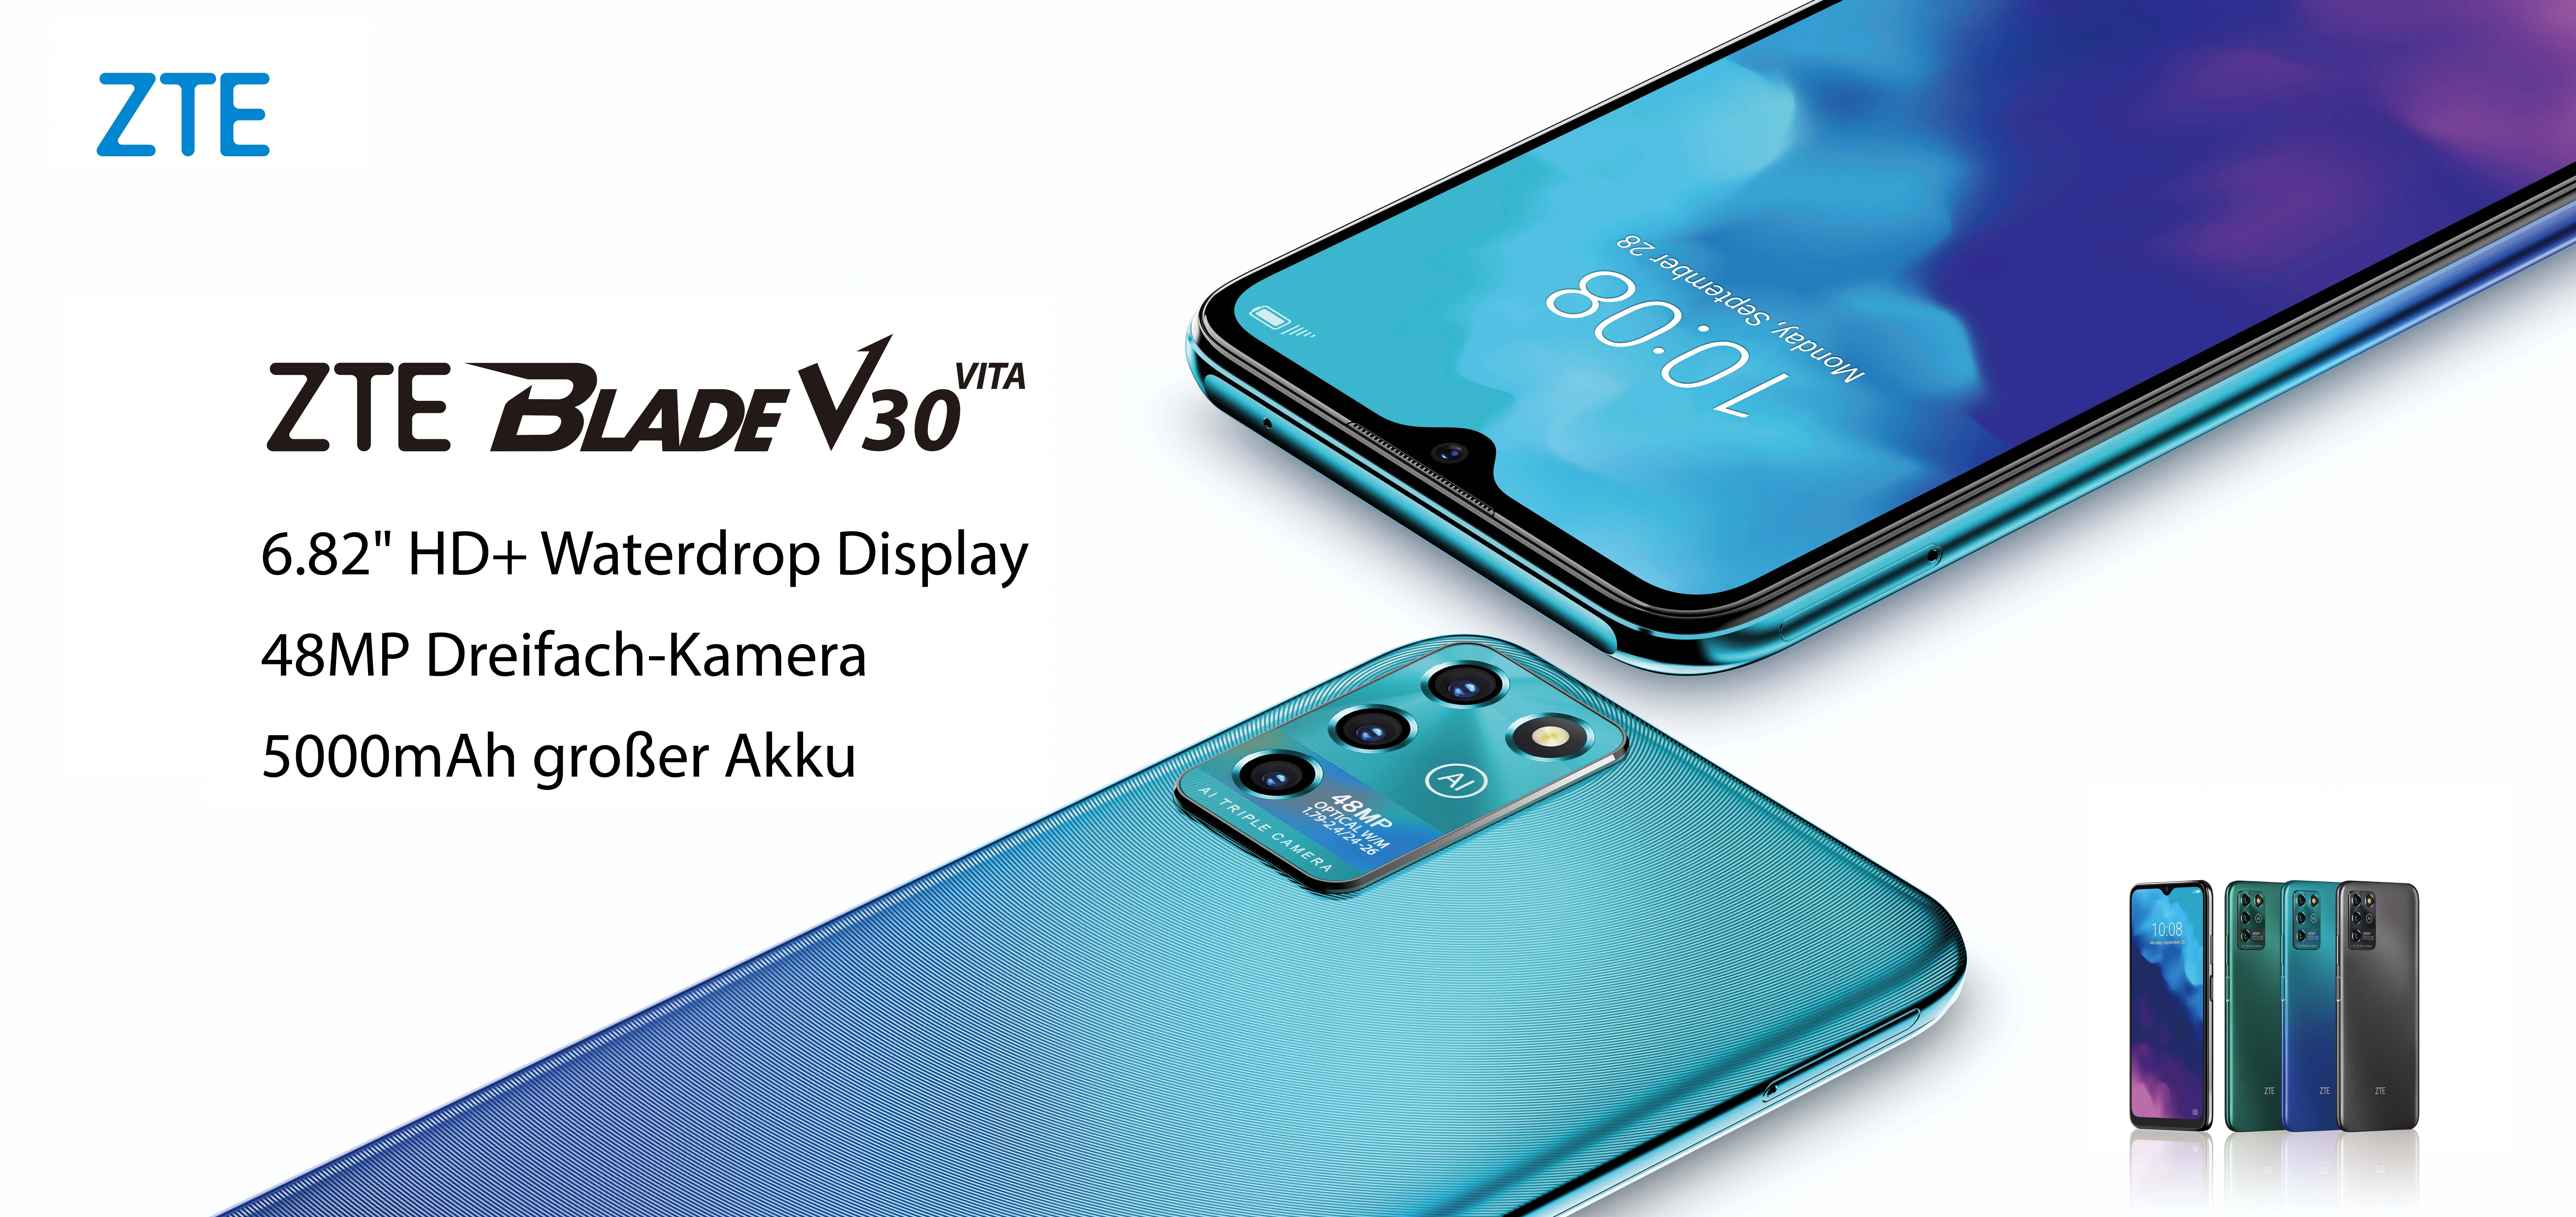 "ZTE Blade V30 Vita mit 6,82"" HD+ Waterdrop Display, 48MP Triple-Kamera und 5000 mAh großer Akku"